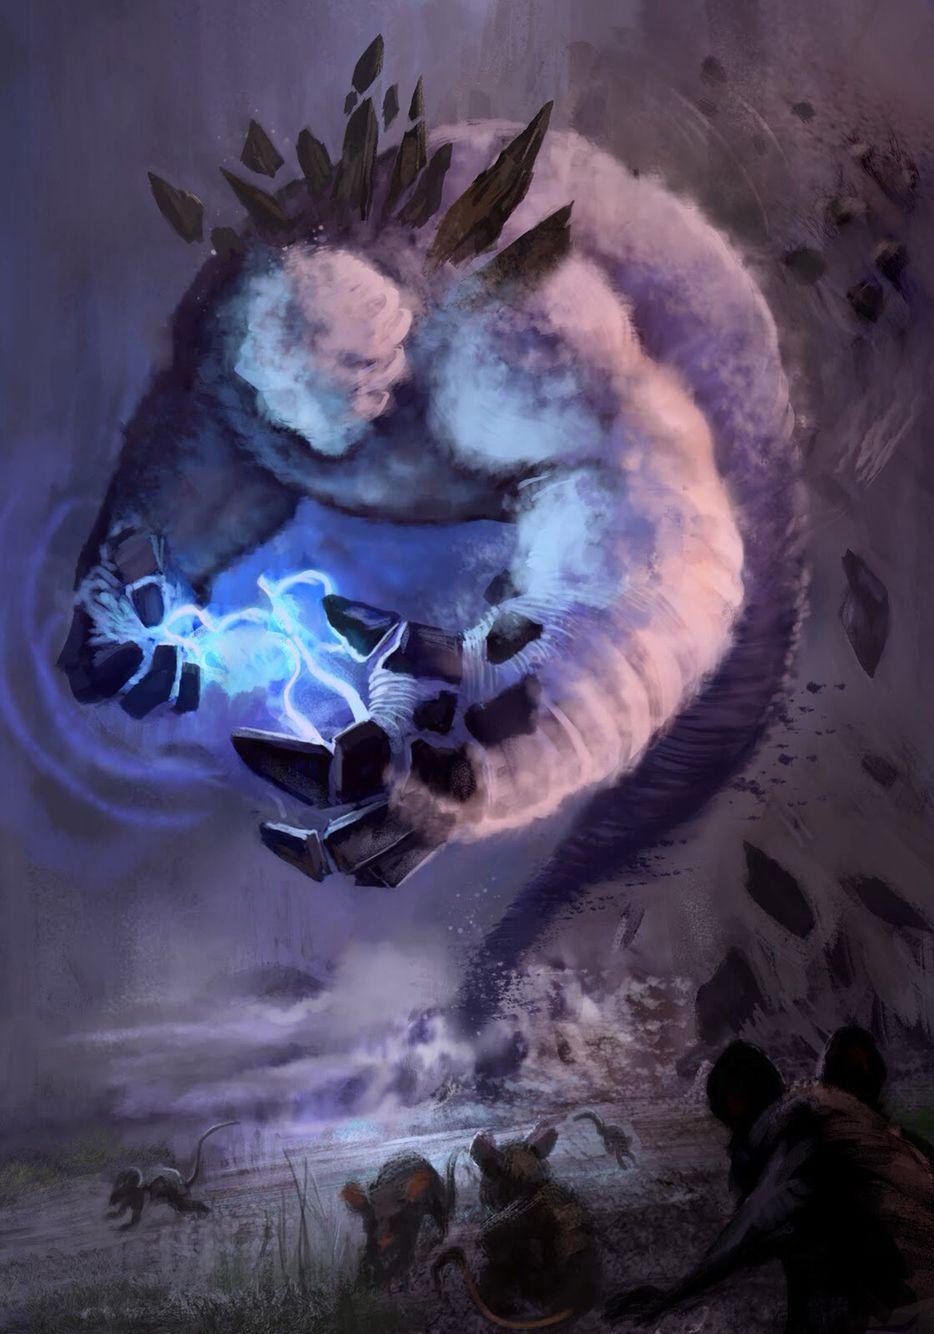 Image of a thunder spirit.